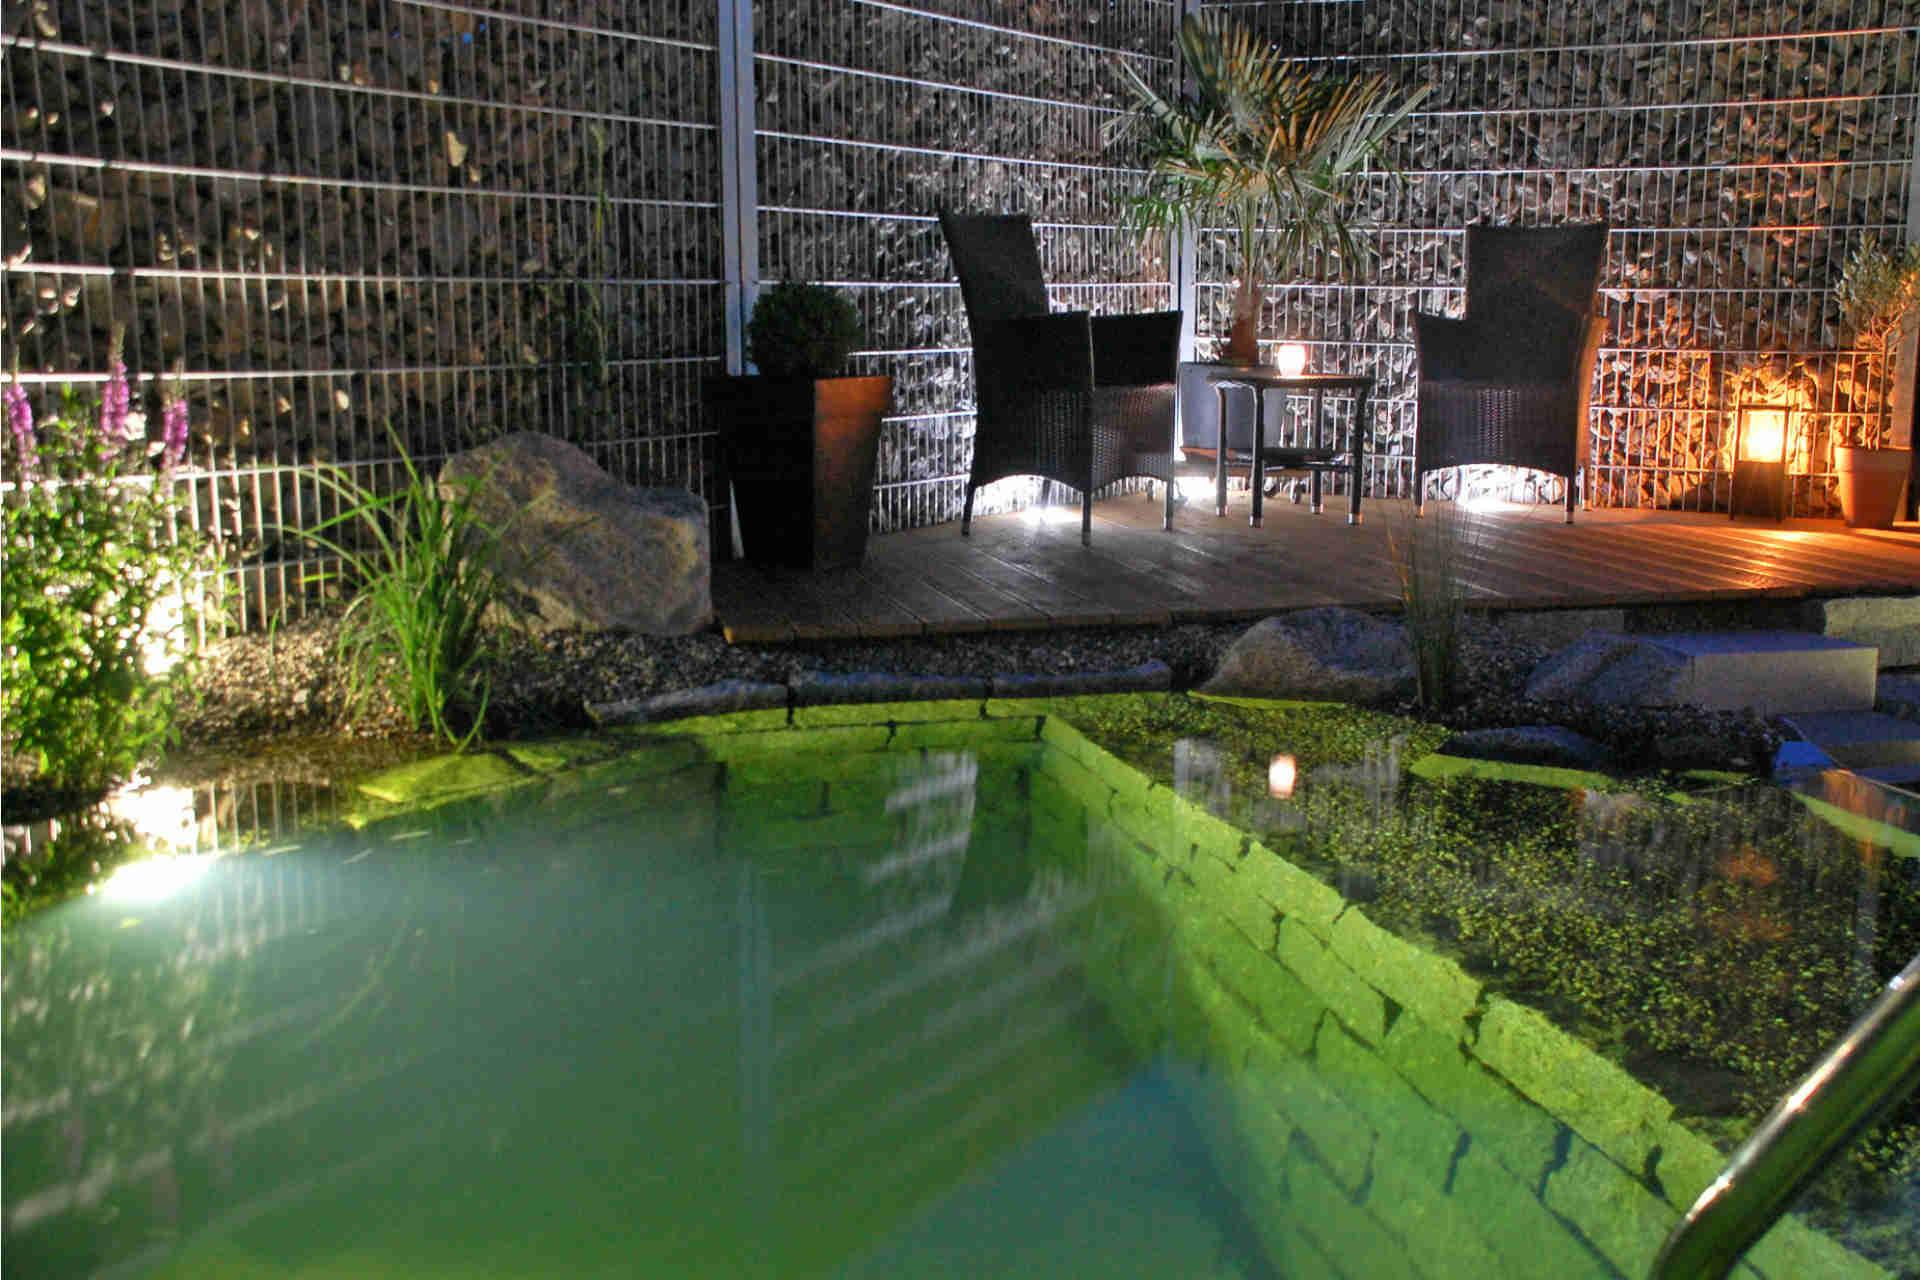 kalhofer gartengestaltung schwimmteiche landschaftsbau. Black Bedroom Furniture Sets. Home Design Ideas